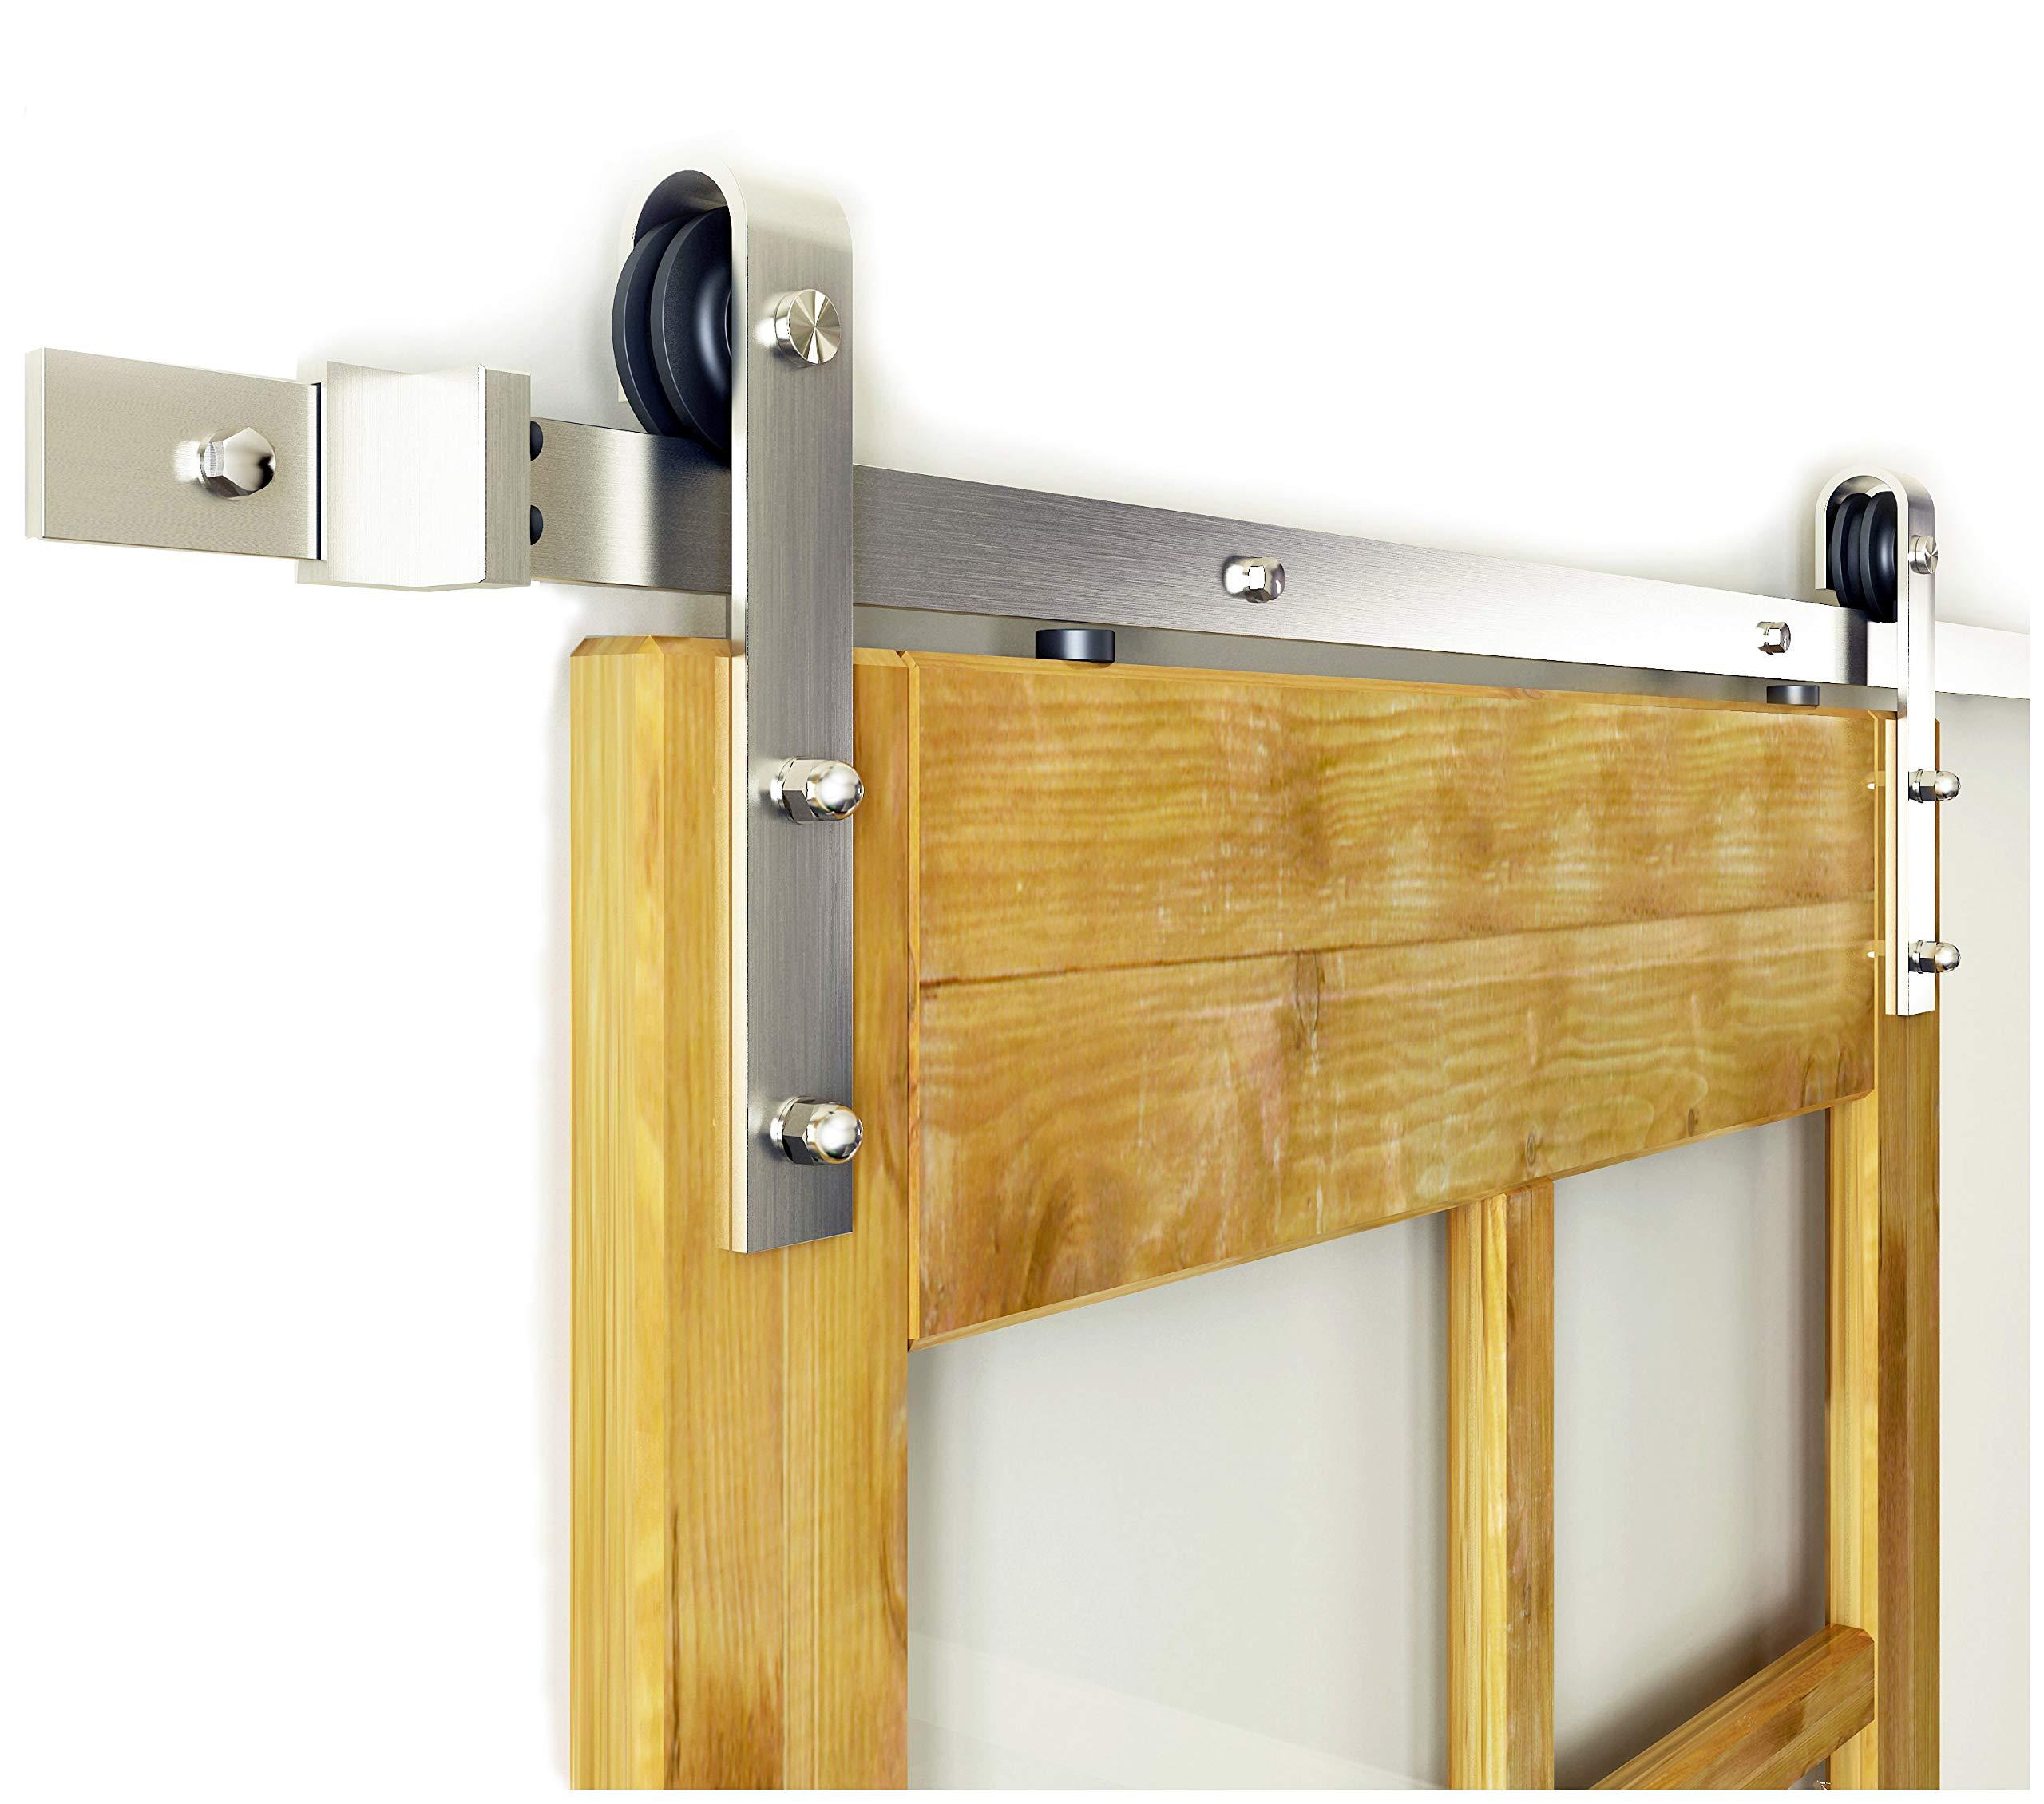 DIYHD SS13 6FT Nickel Steel Sliding Wood Hardware Brushed Barn Door Track Kit, 6 Feet Single